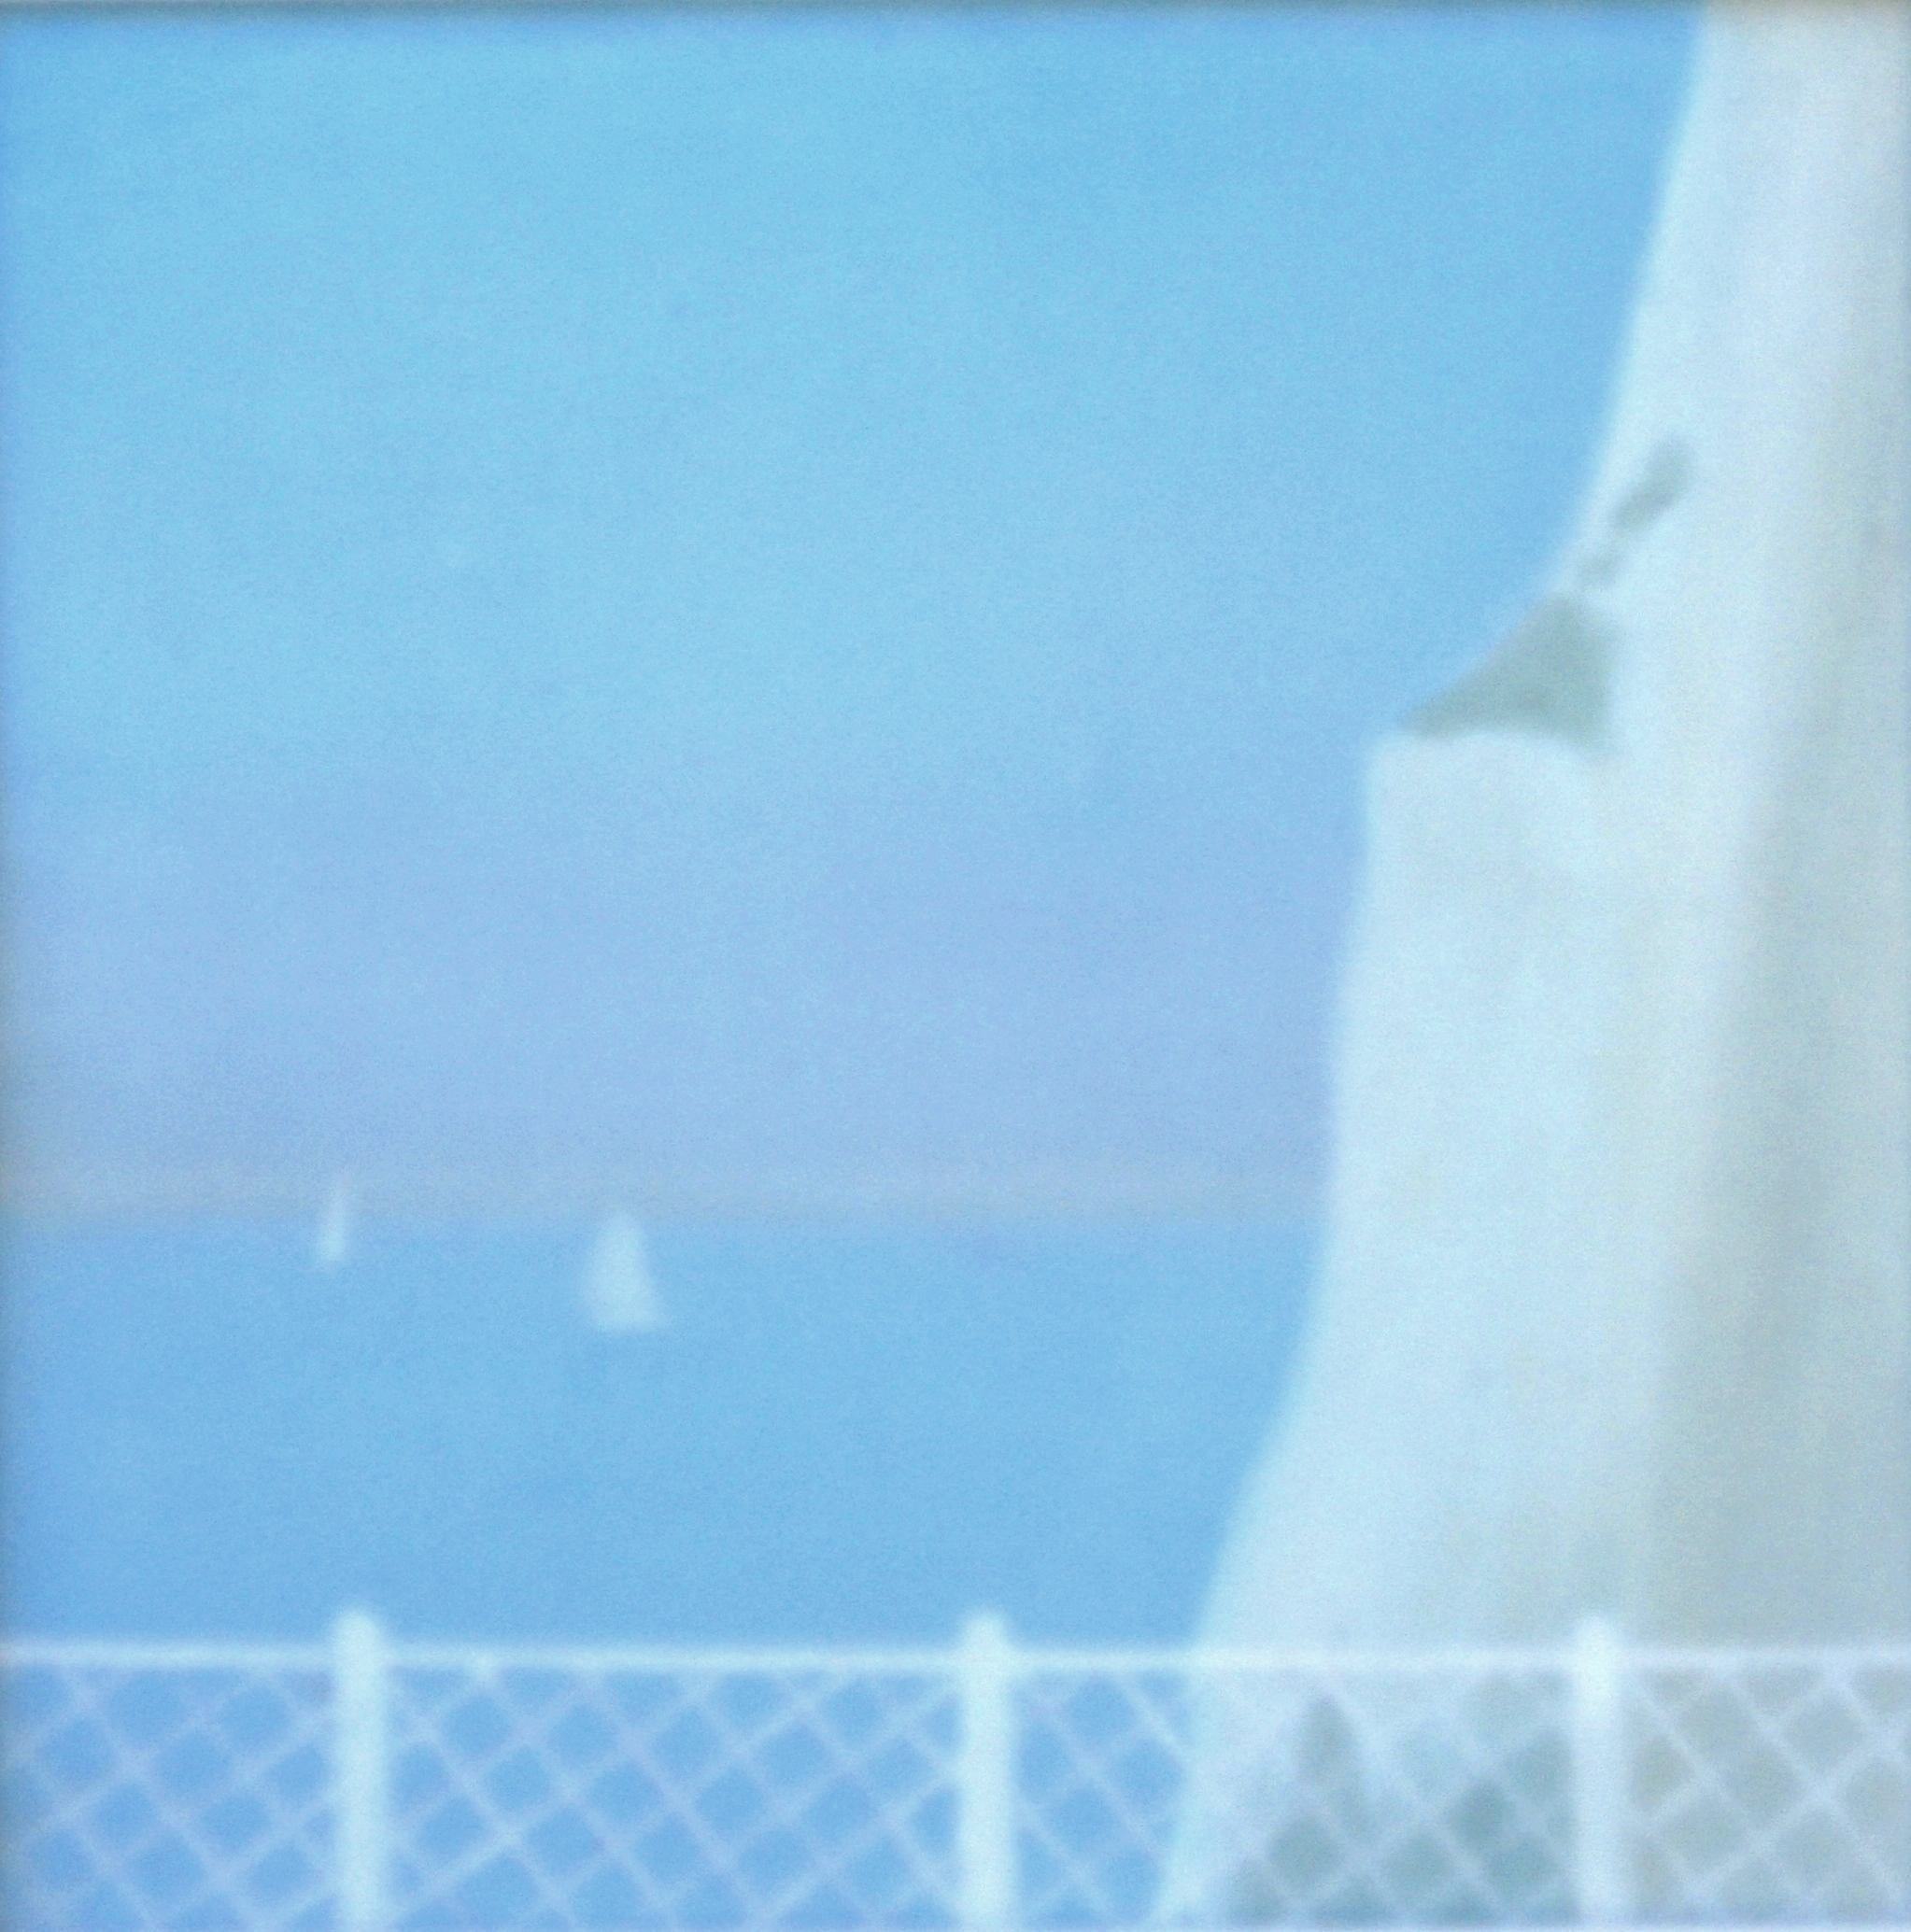 "PICARDY COAST II  7.5X7.5"" (19X19cm) Oil on canvas"